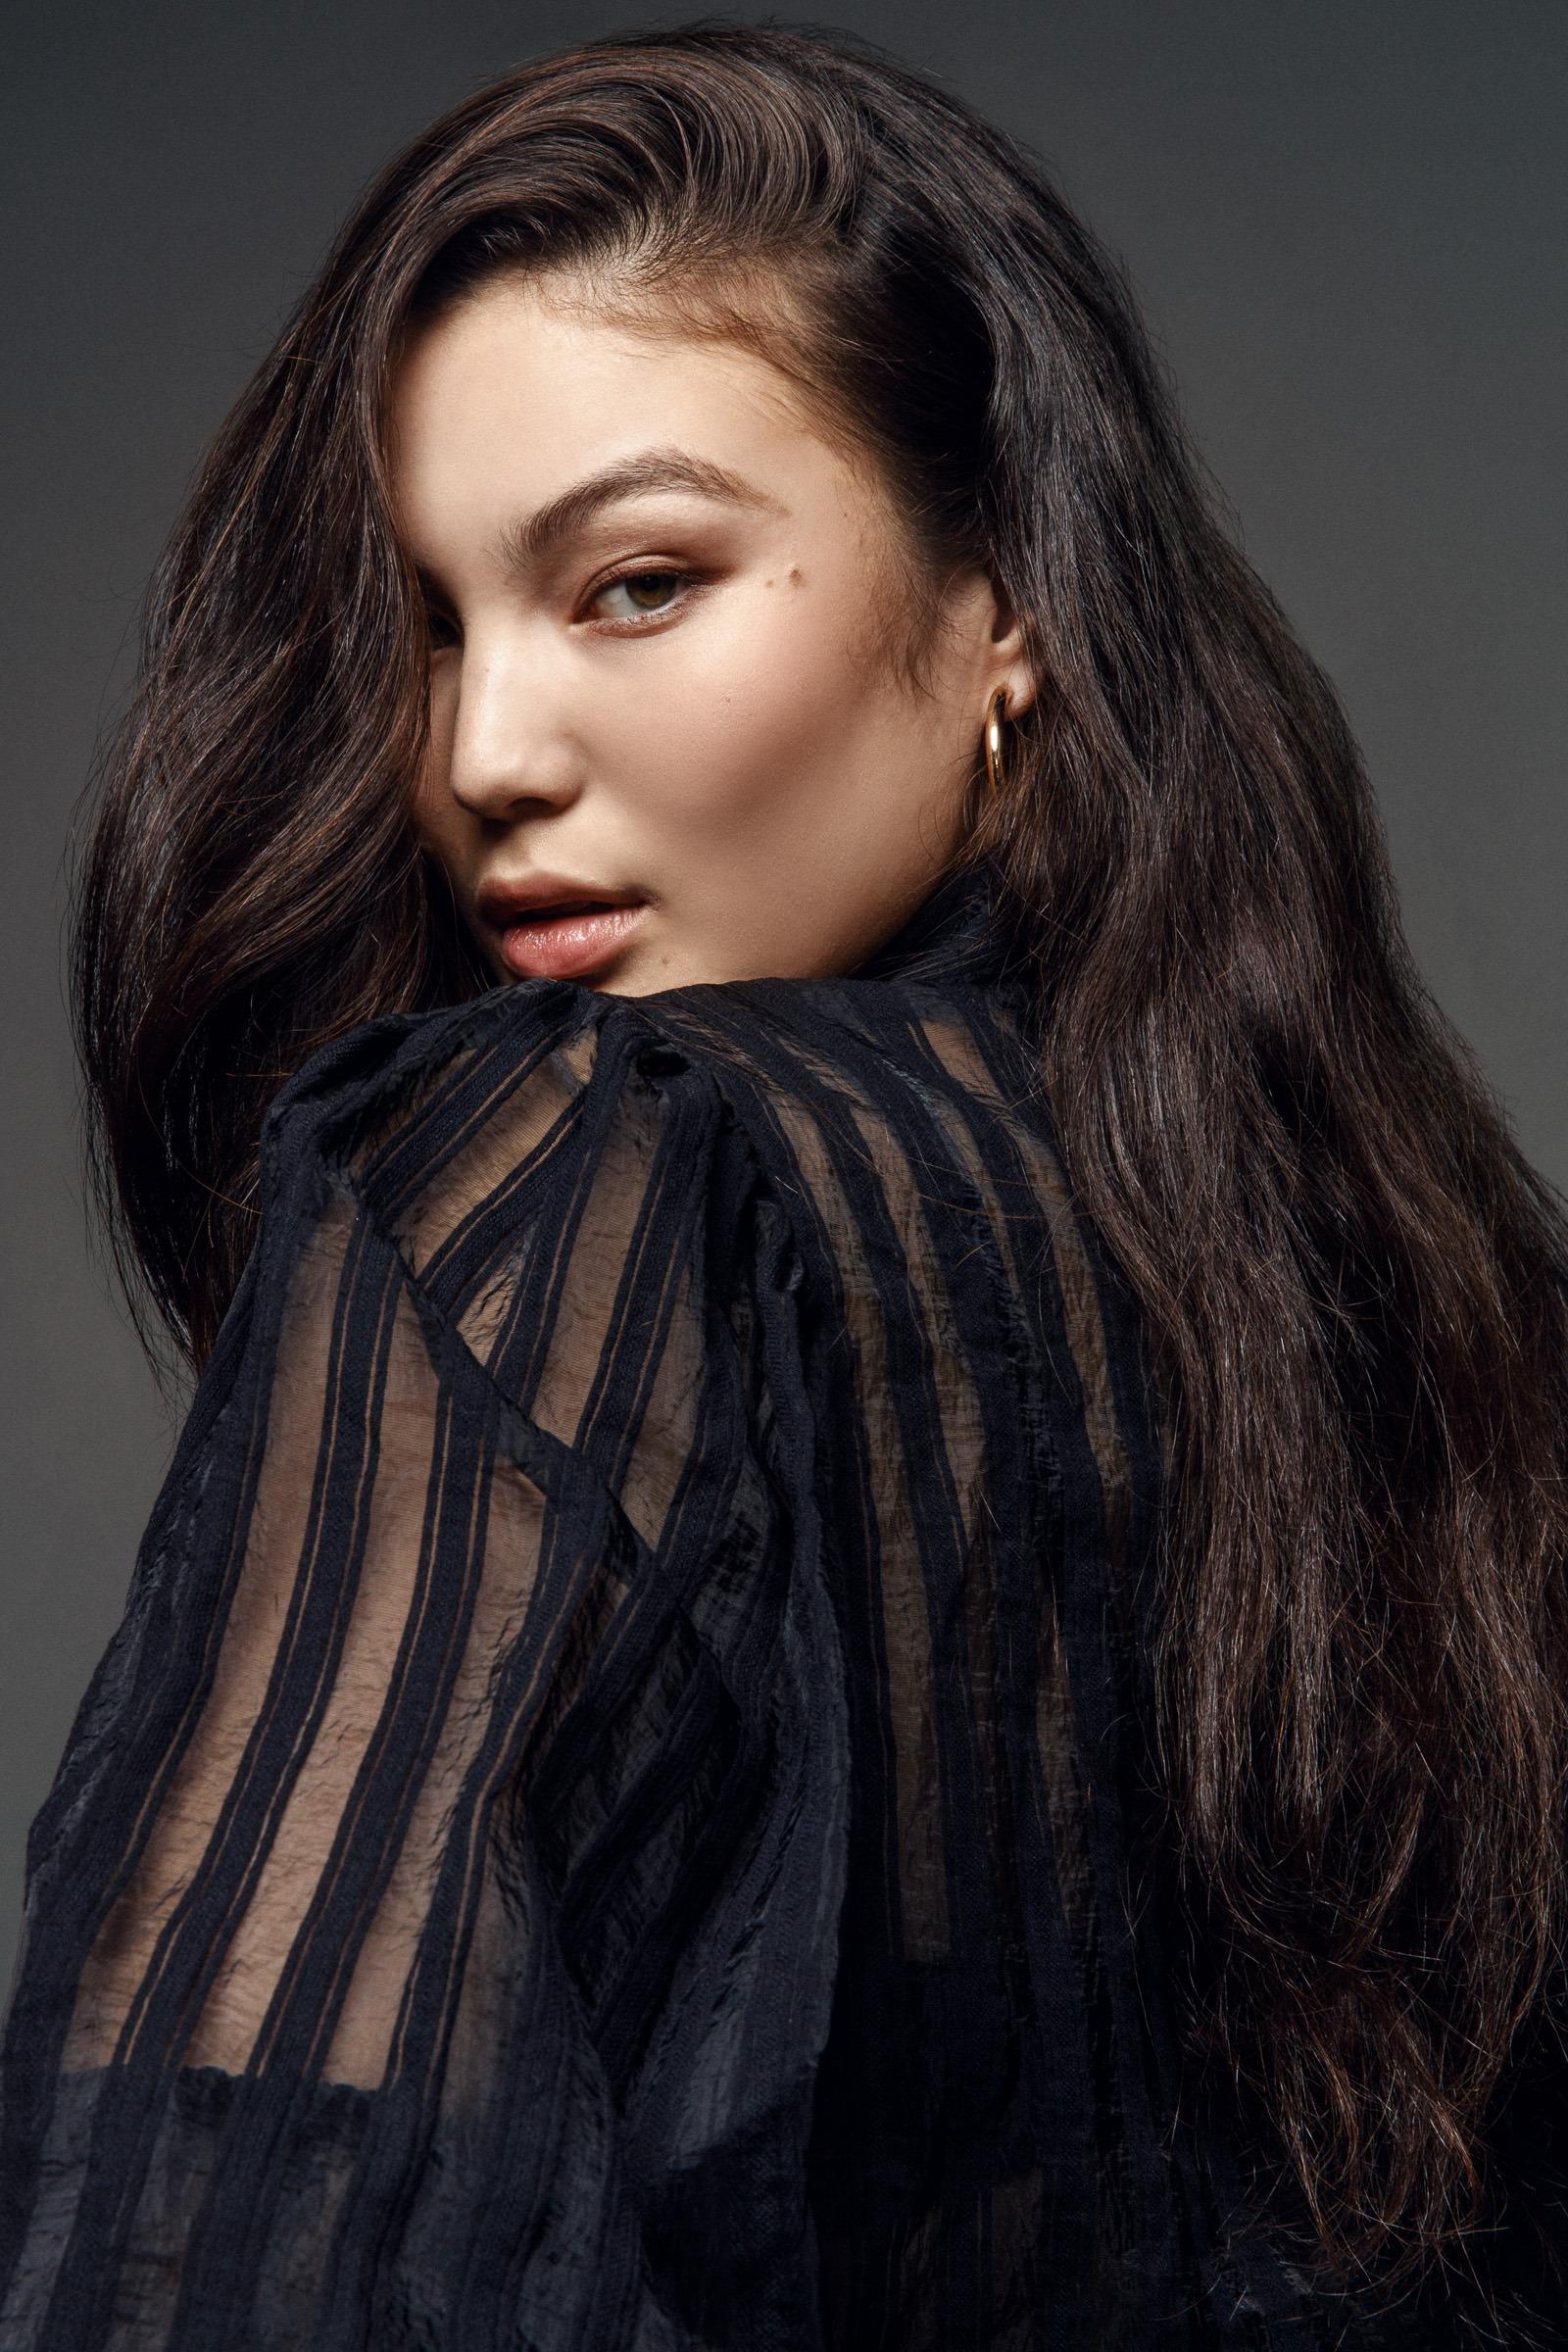 portrait of model sarah hemi system agency wearing sequin top in a studio in Tokyo